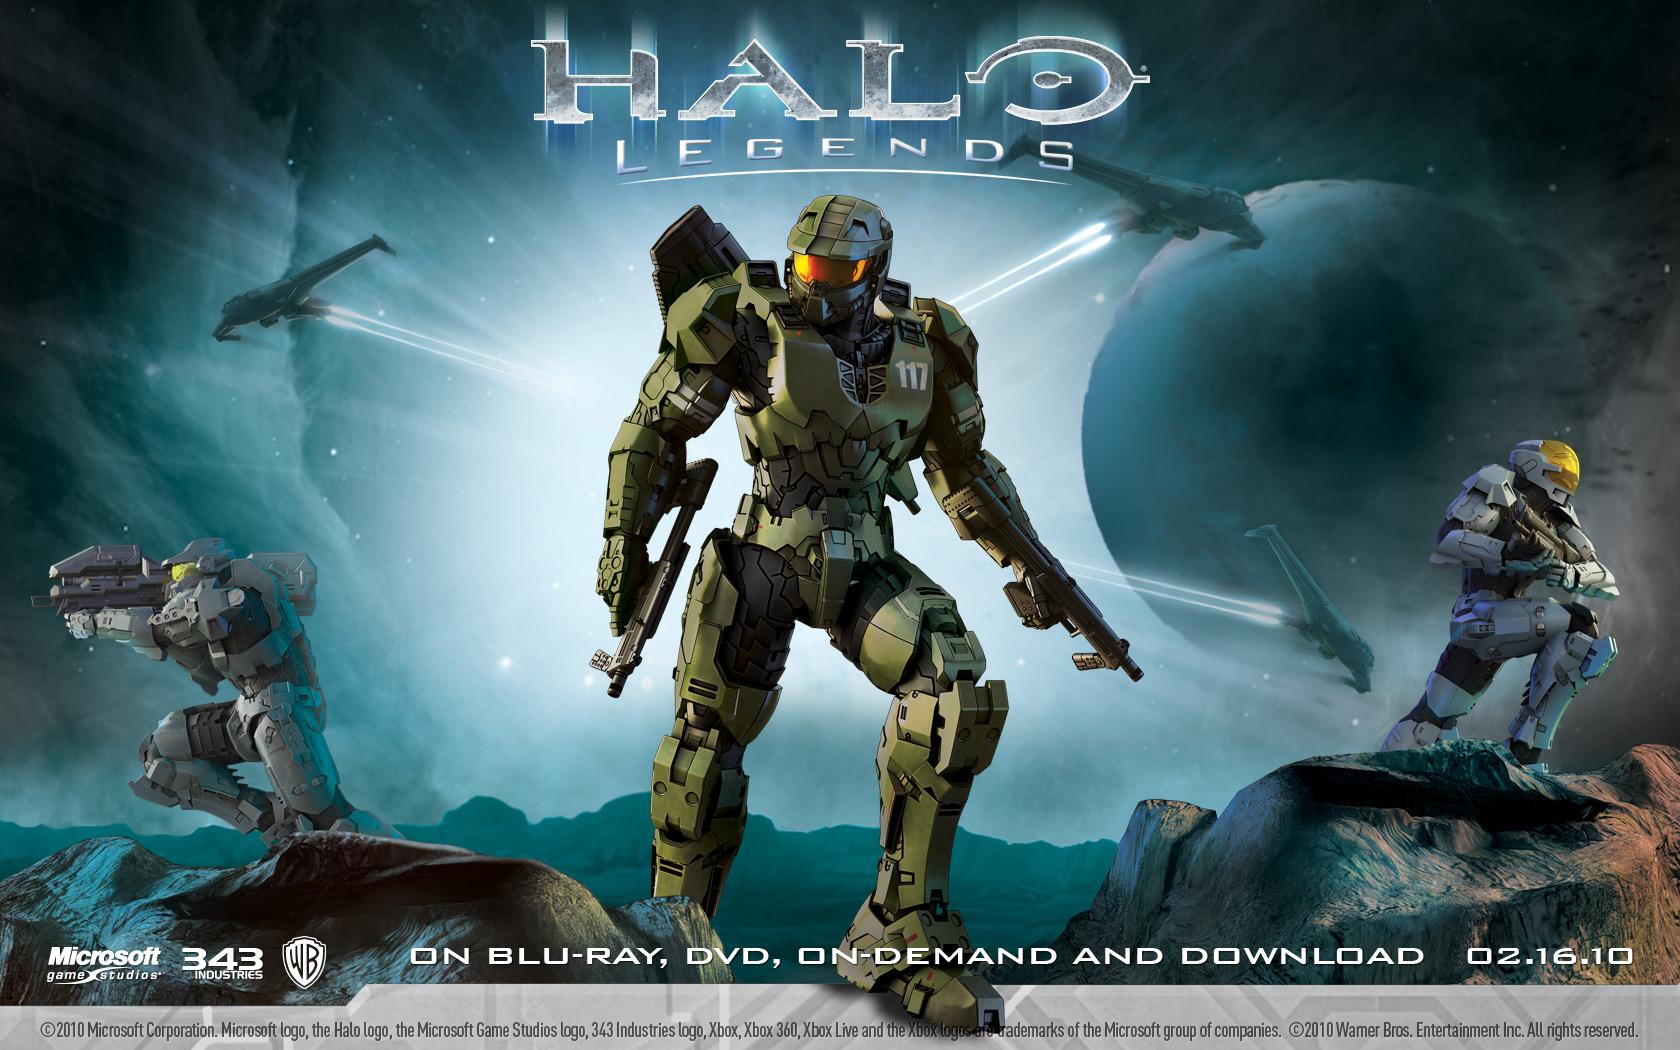 Halo Legends #3